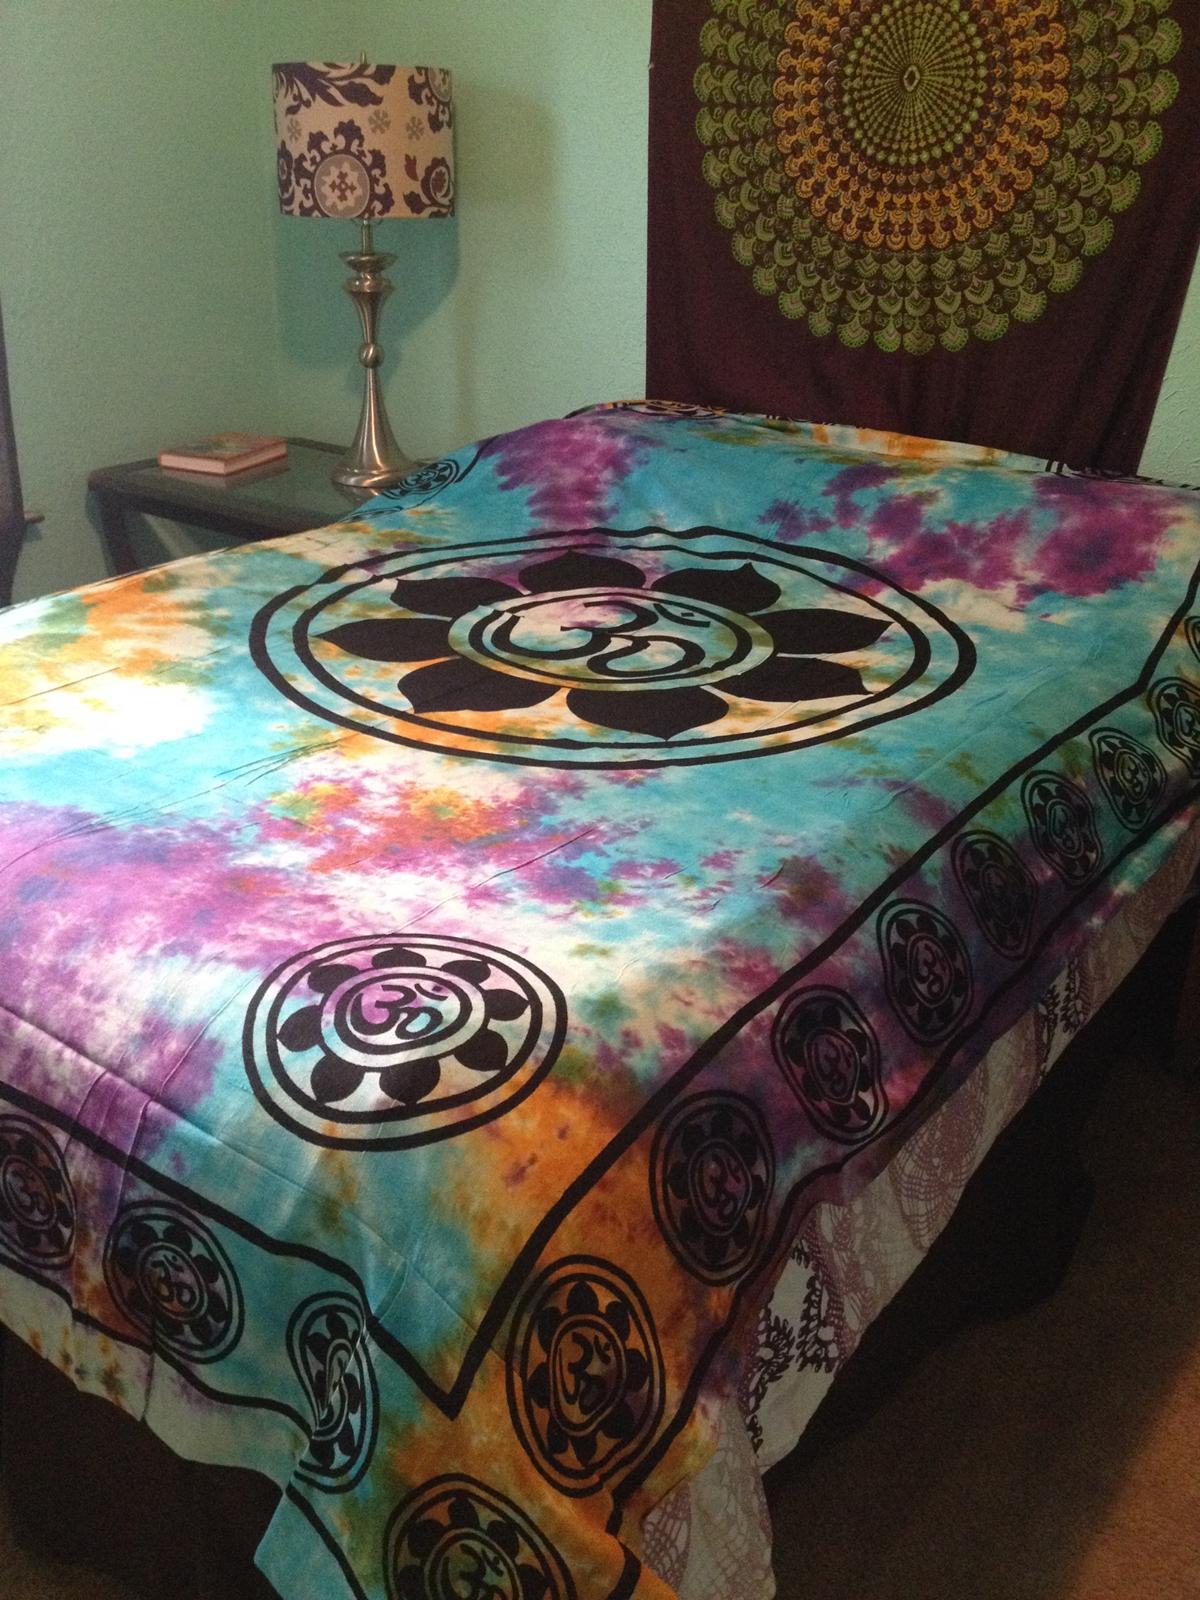 Om Aum Yoga Indian Lotus Flower India Hippie Boho Tie Dye Wall